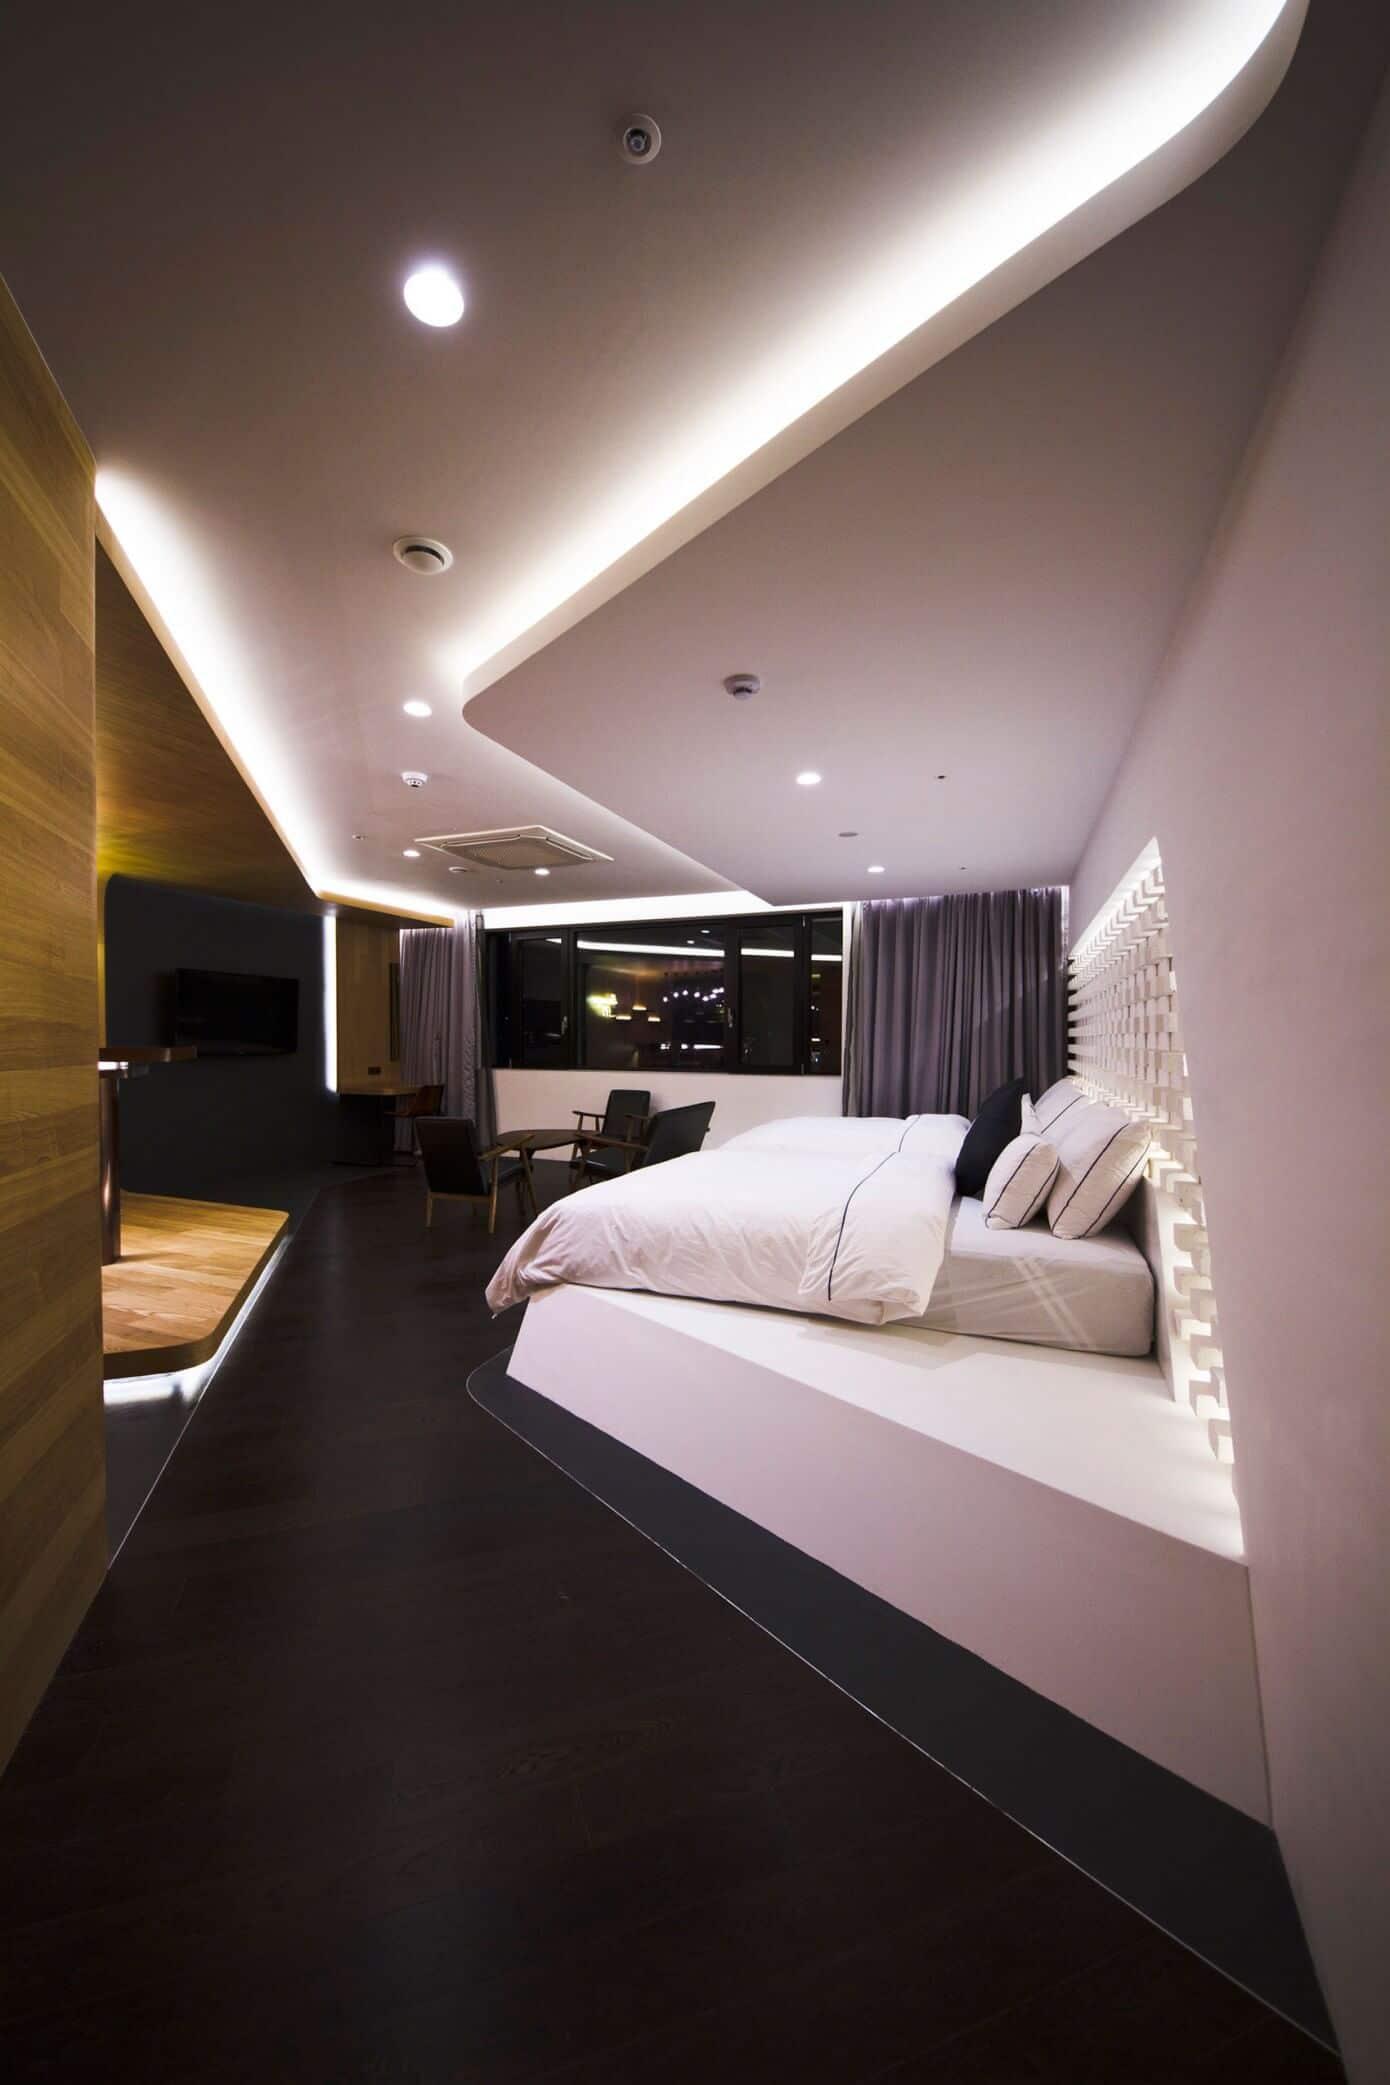 Iluminacion interior moderna